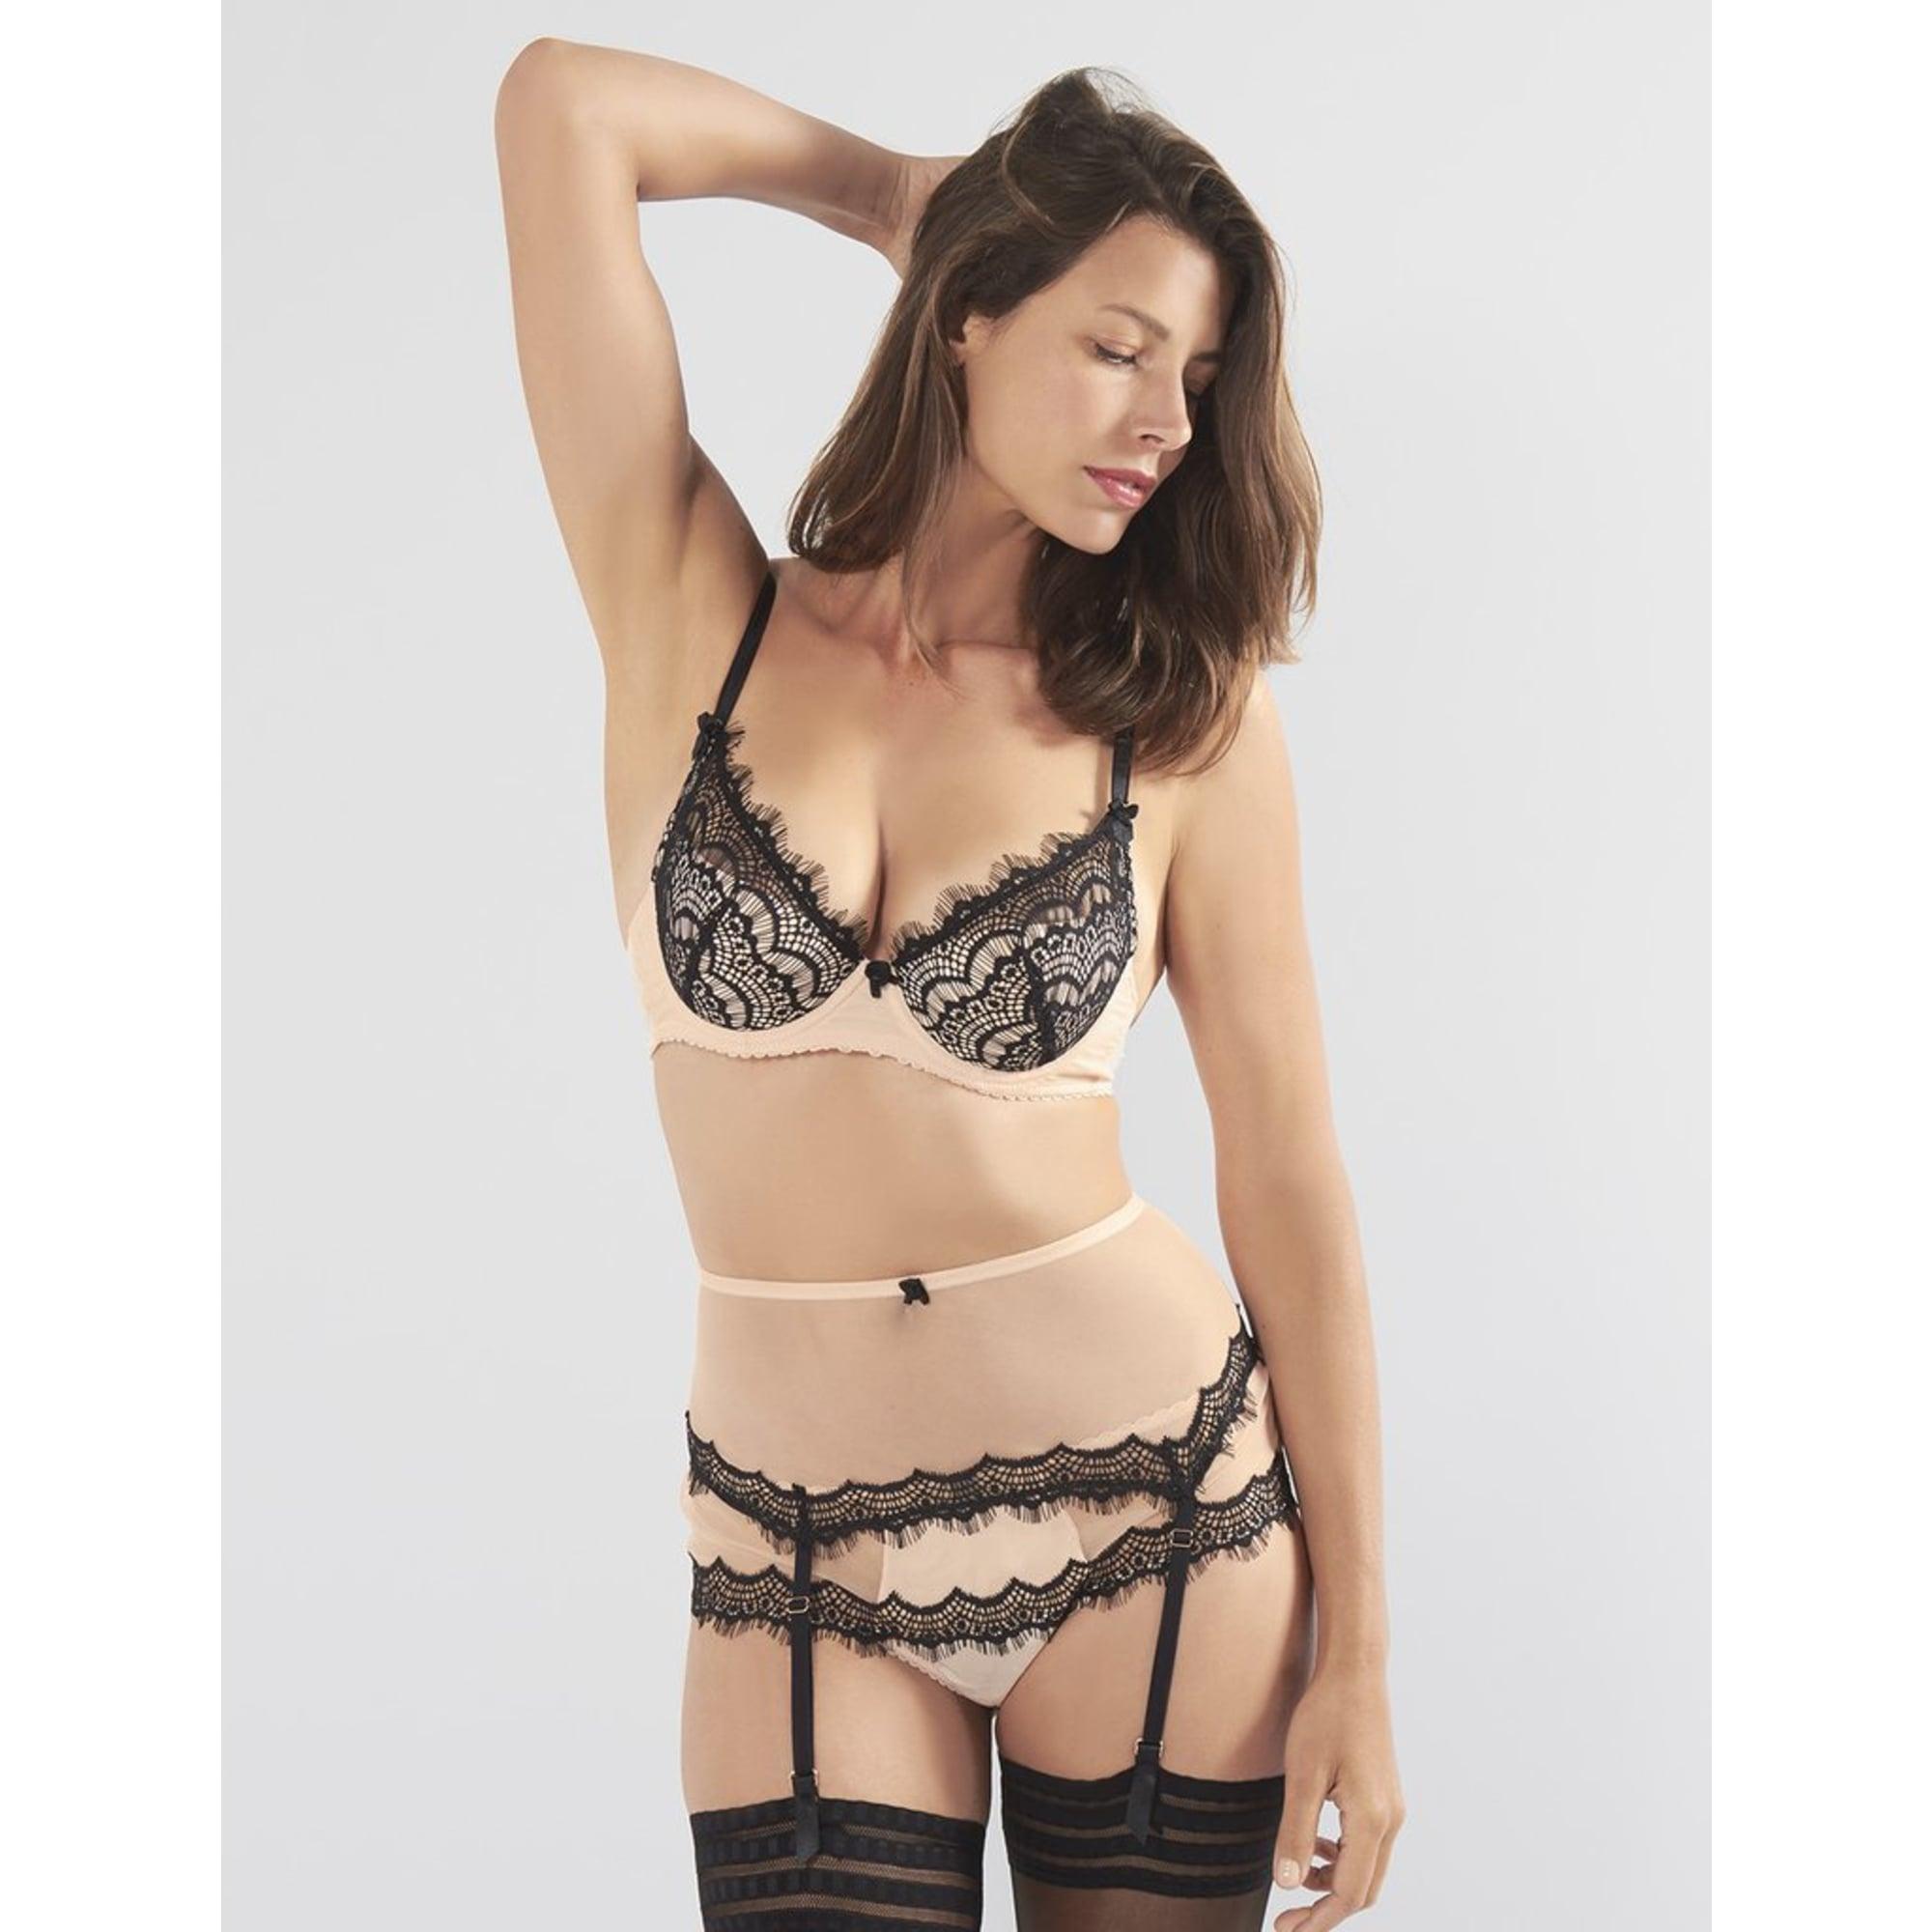 bisou bisou zoo corset nude & black boyshorts - night, loungewear